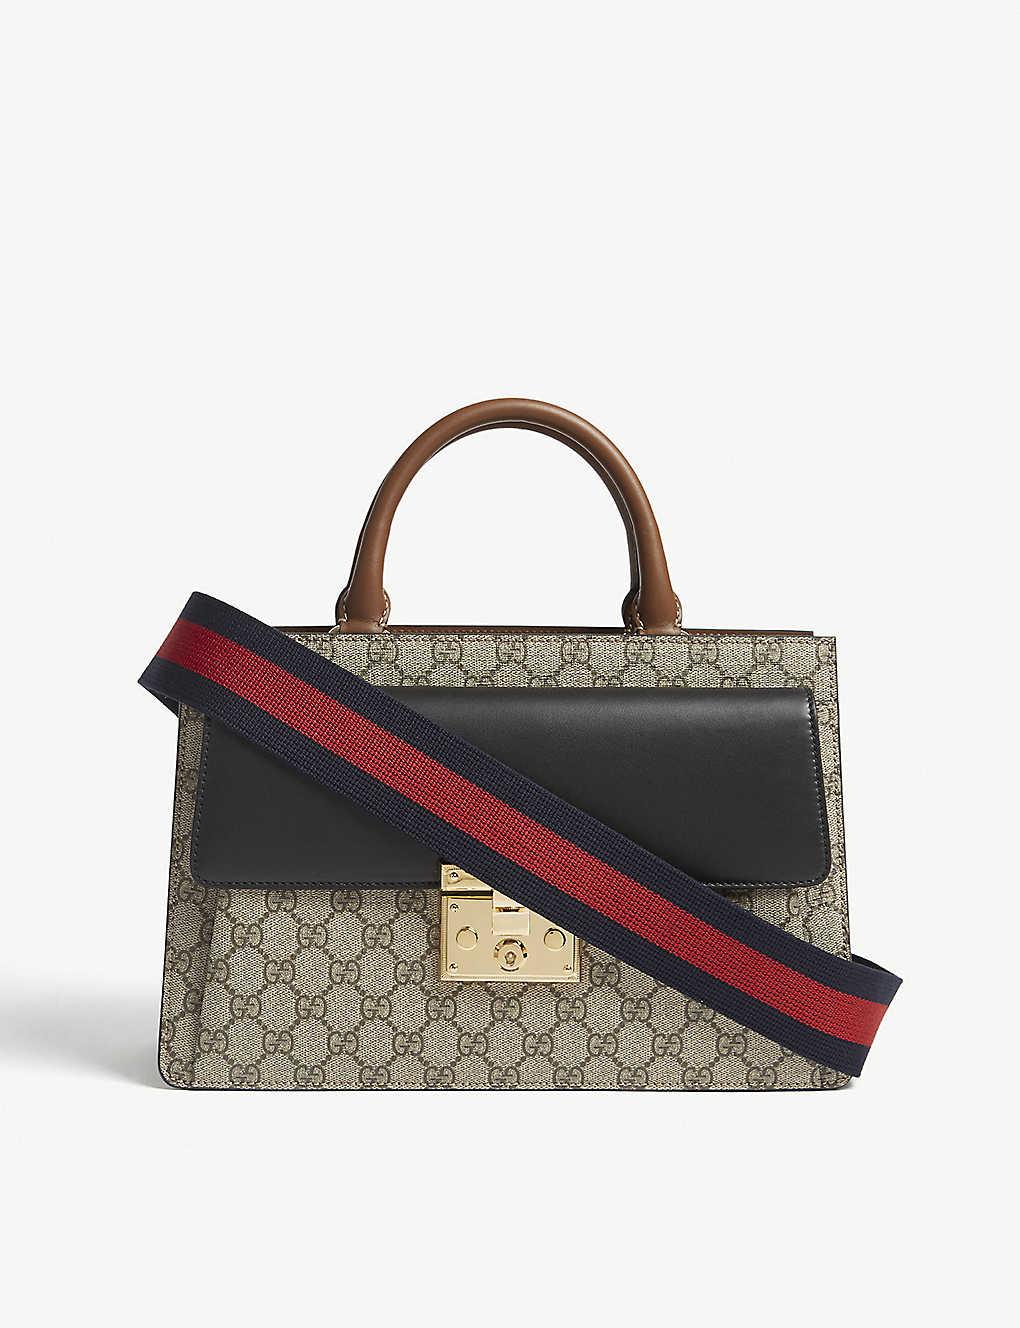 35ad27179281 GUCCI - Padlock GG Supreme and leather shoulder bag | Selfridges.com